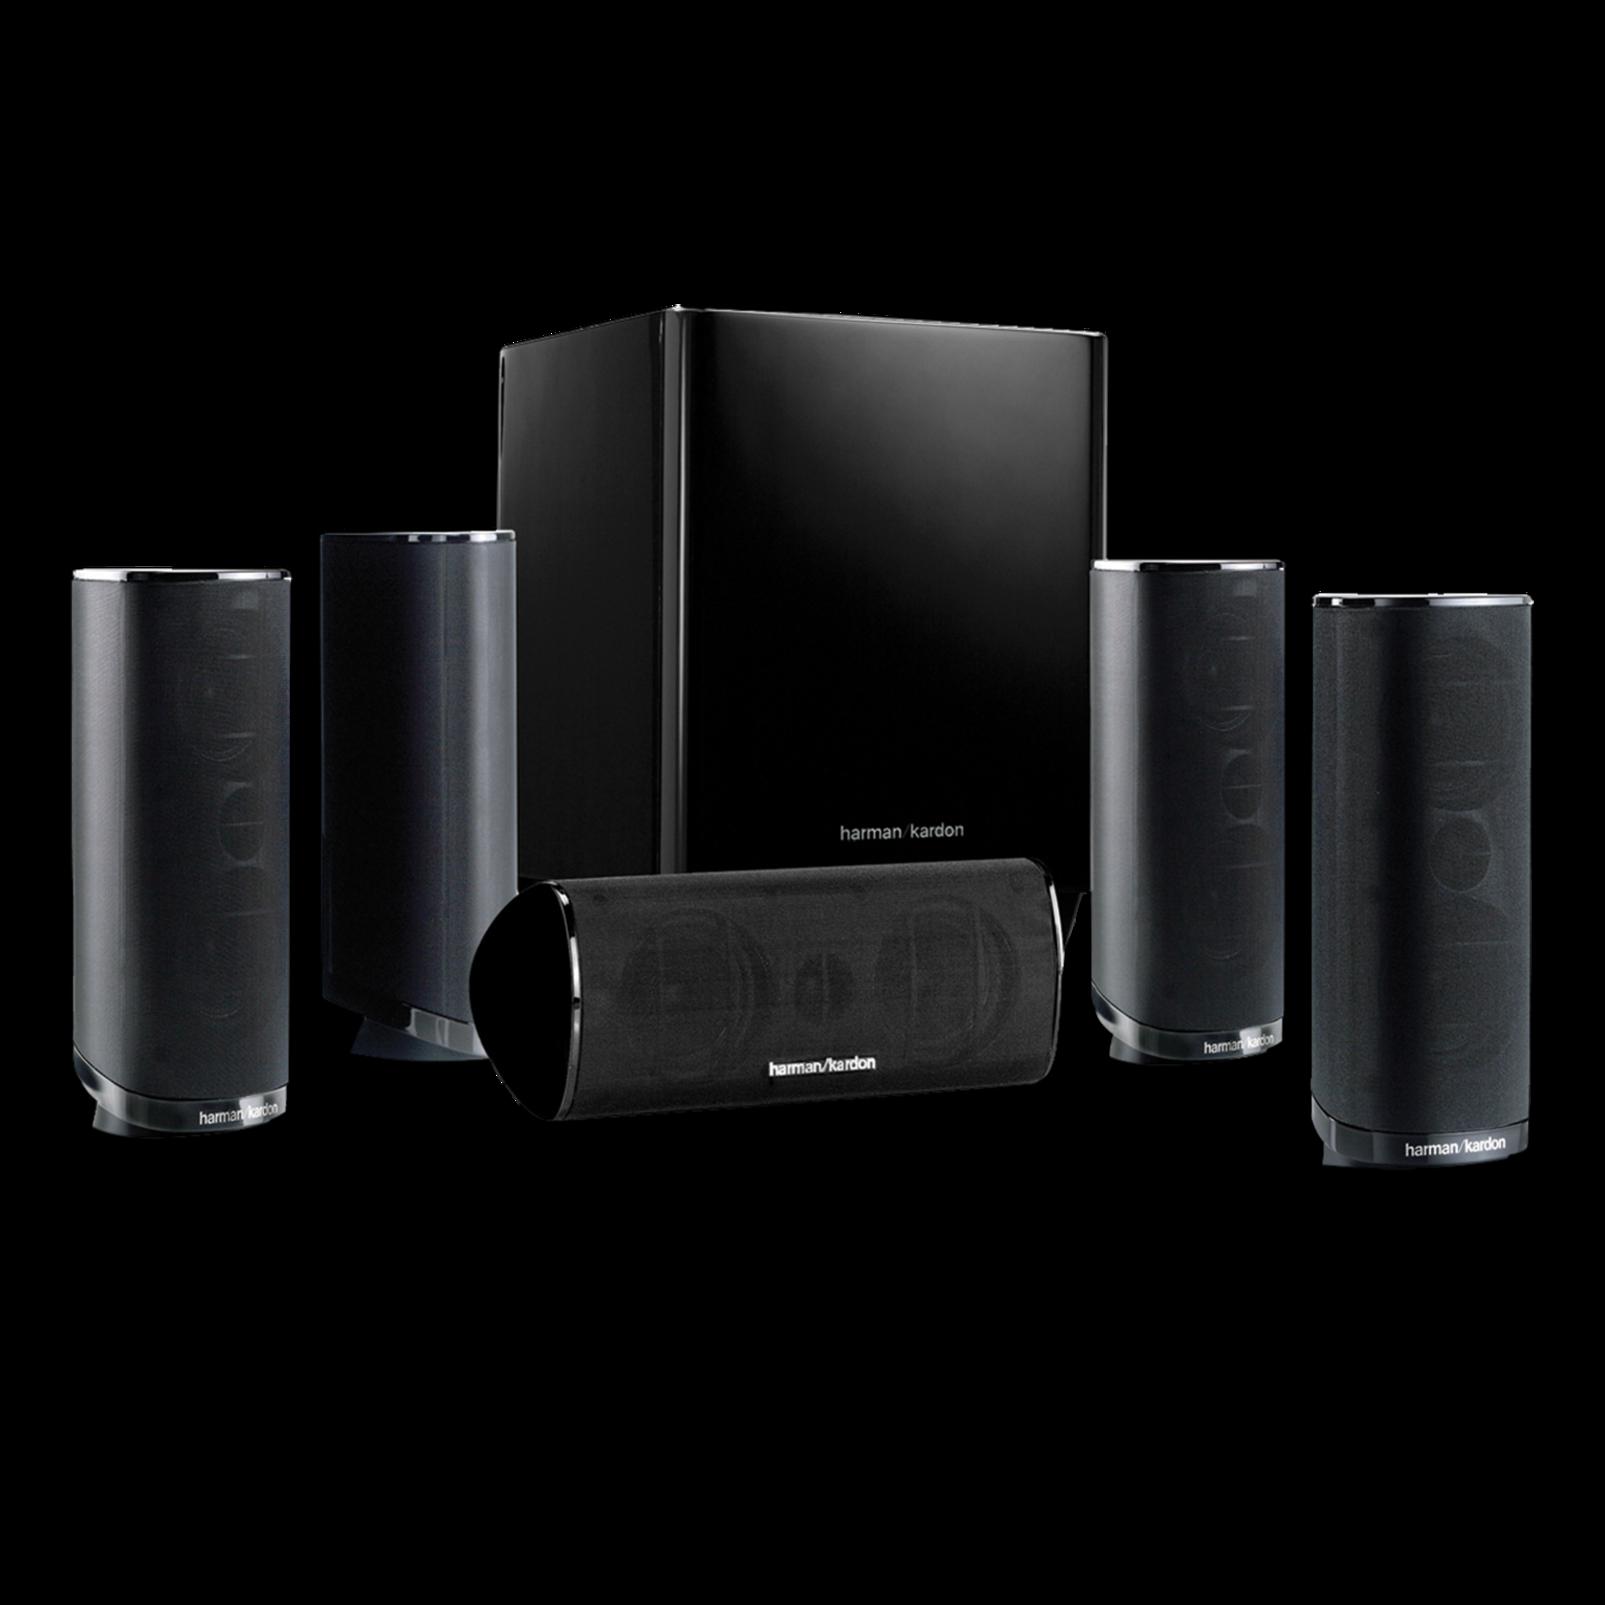 Harman Kardon HKTS 16 5.1 Home Speaker System $200 + Free Shipping